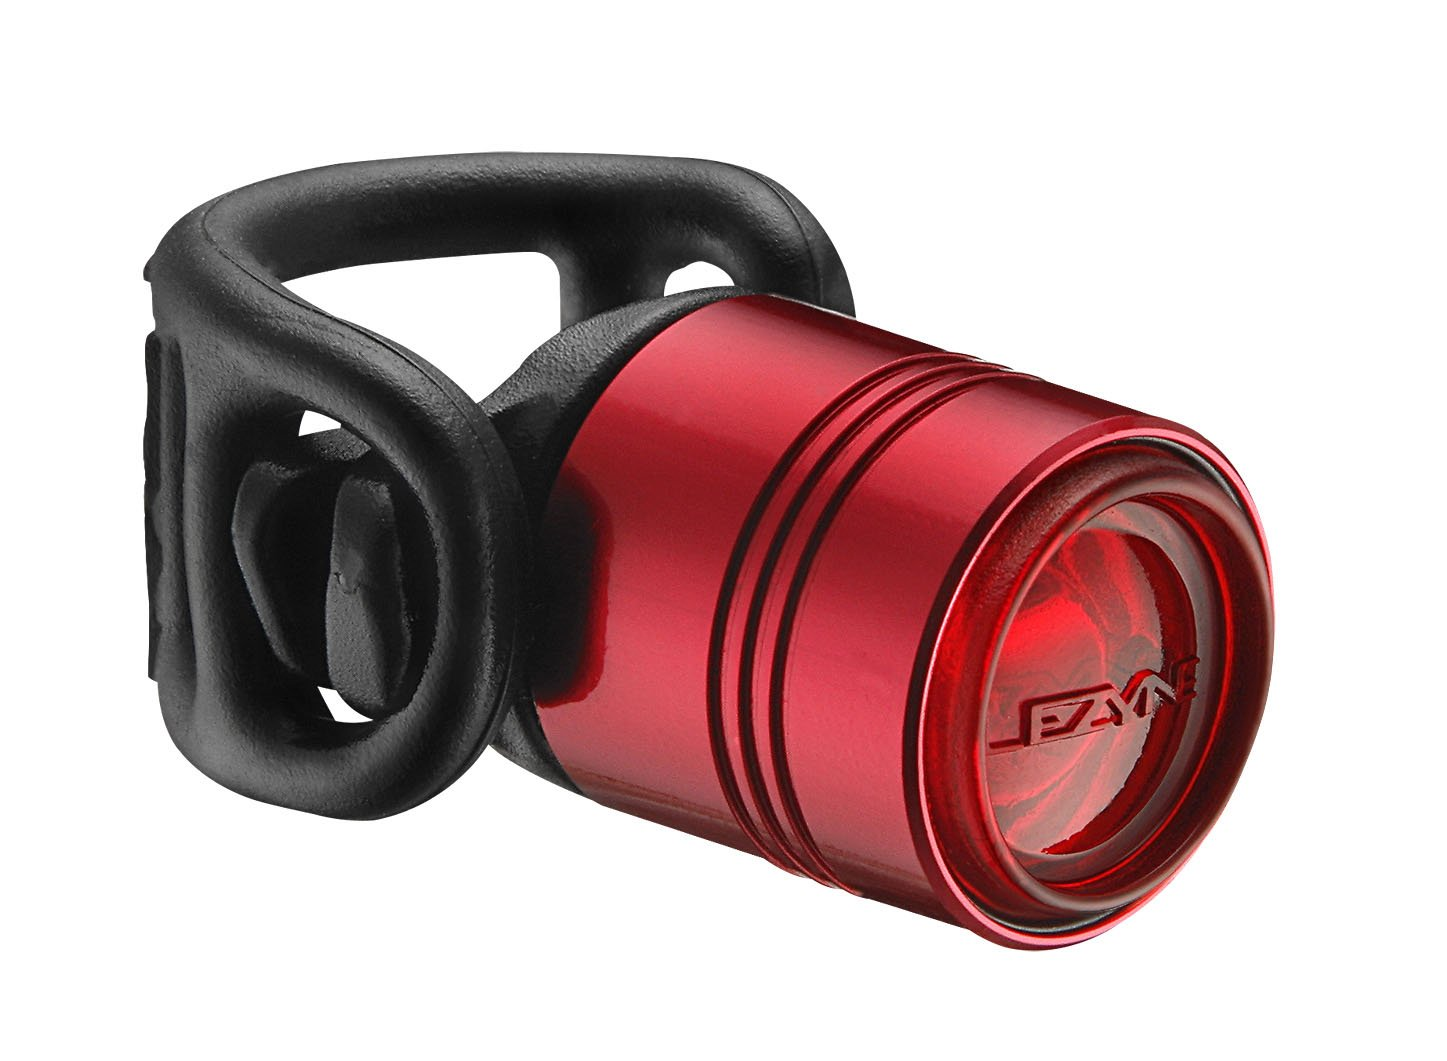 LEZYNE Femto Drive LED Gold//Polish//Hi Gloss 2Wheel Distribution GmbH /& Co KG inaktiv 1-LED-1R-V112